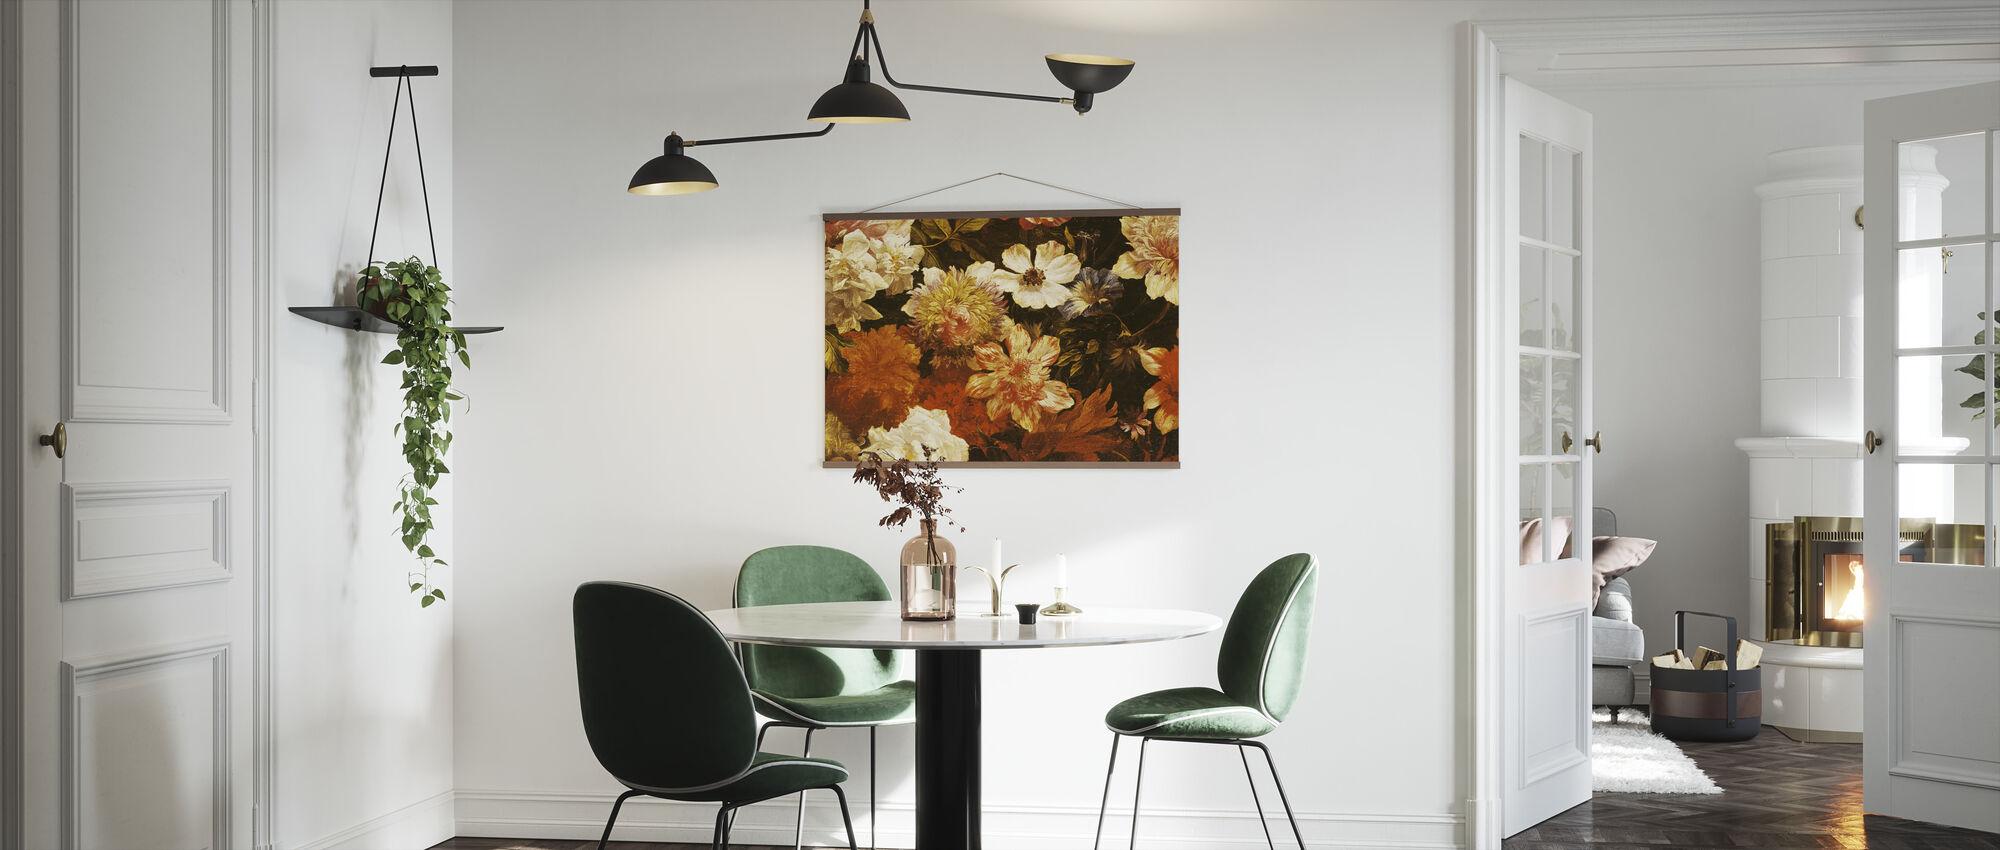 Detail of Flowers - Michelangelo Cerquozzi - Poster - Kitchen